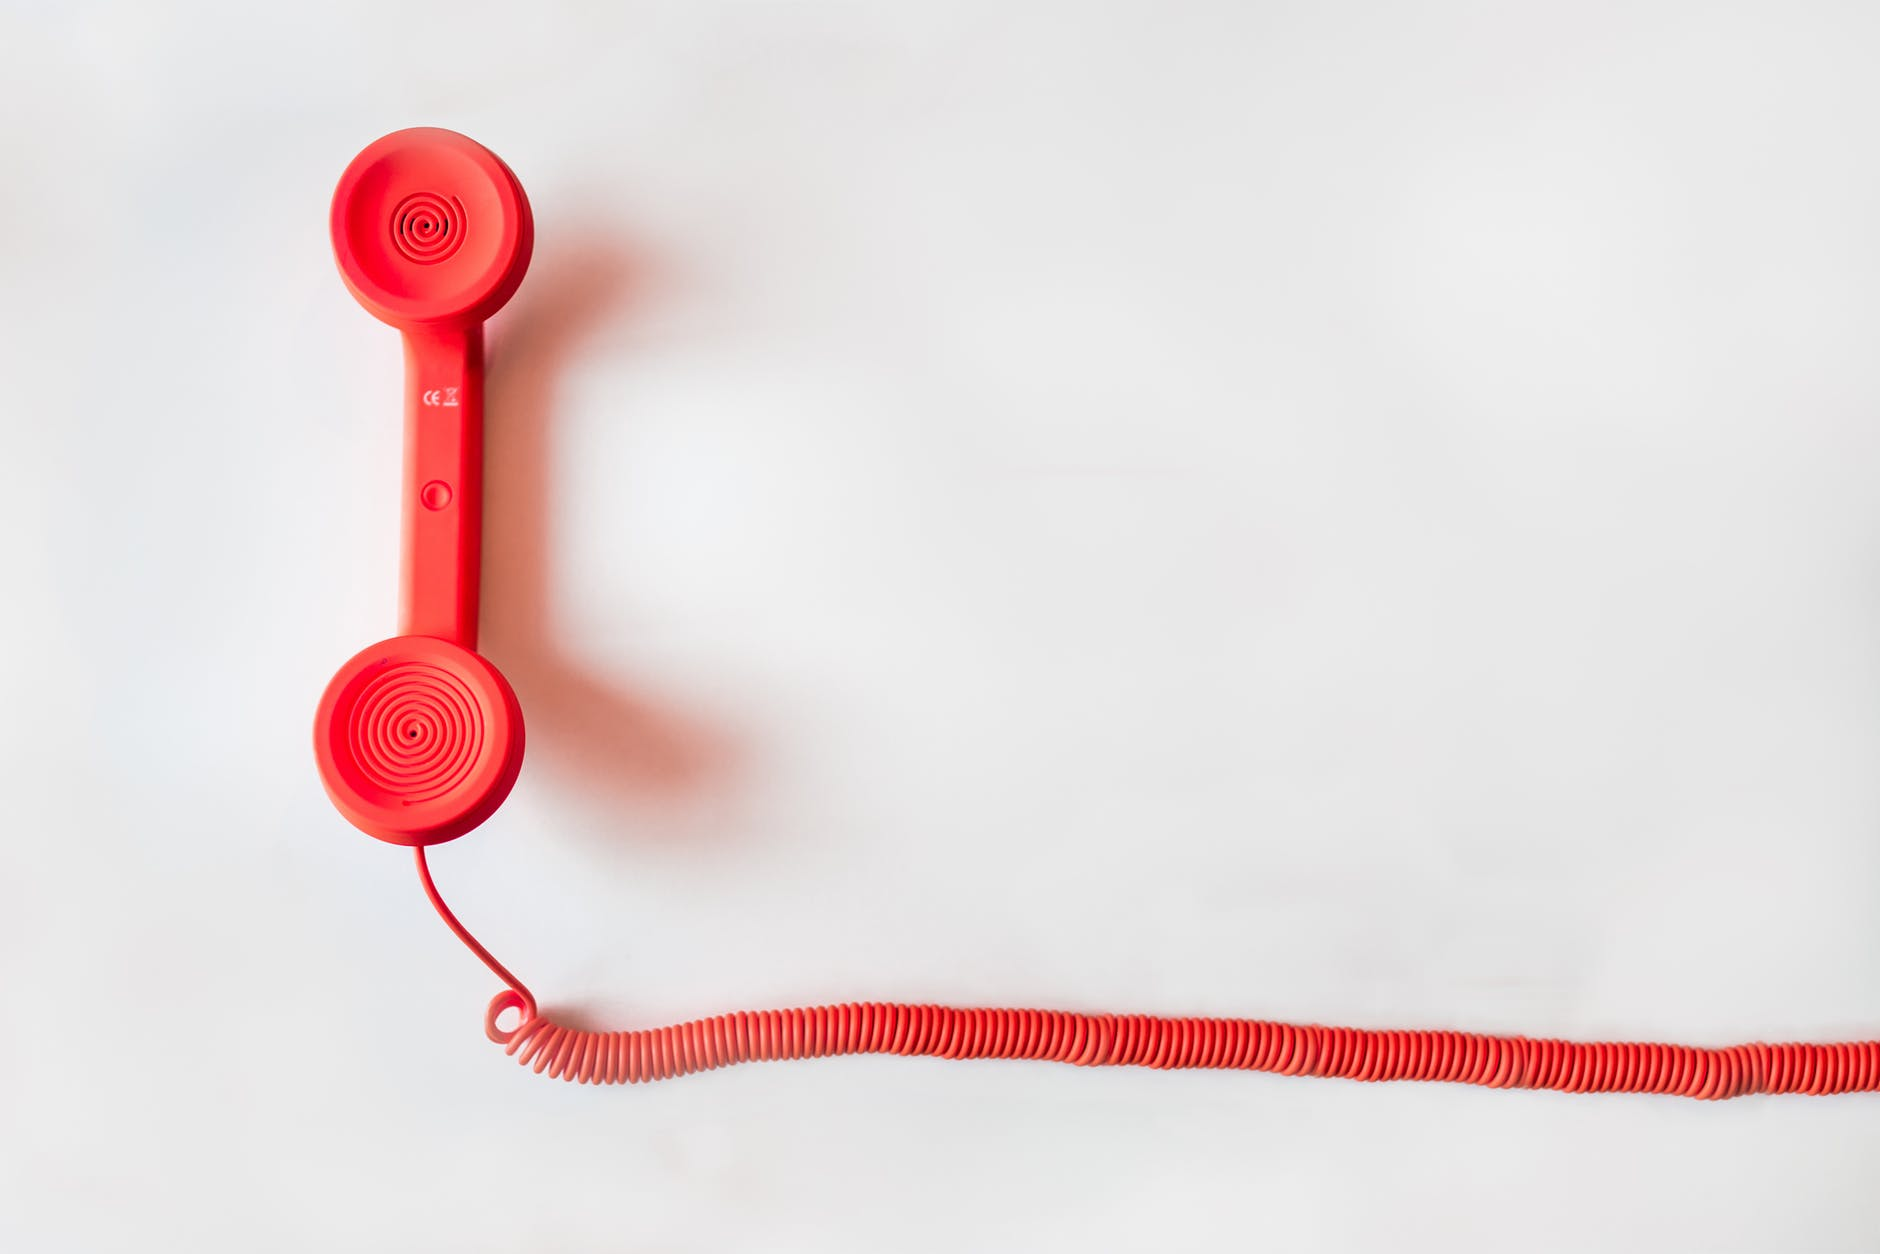 VOIP per telefonare: tutti i vantaggi.